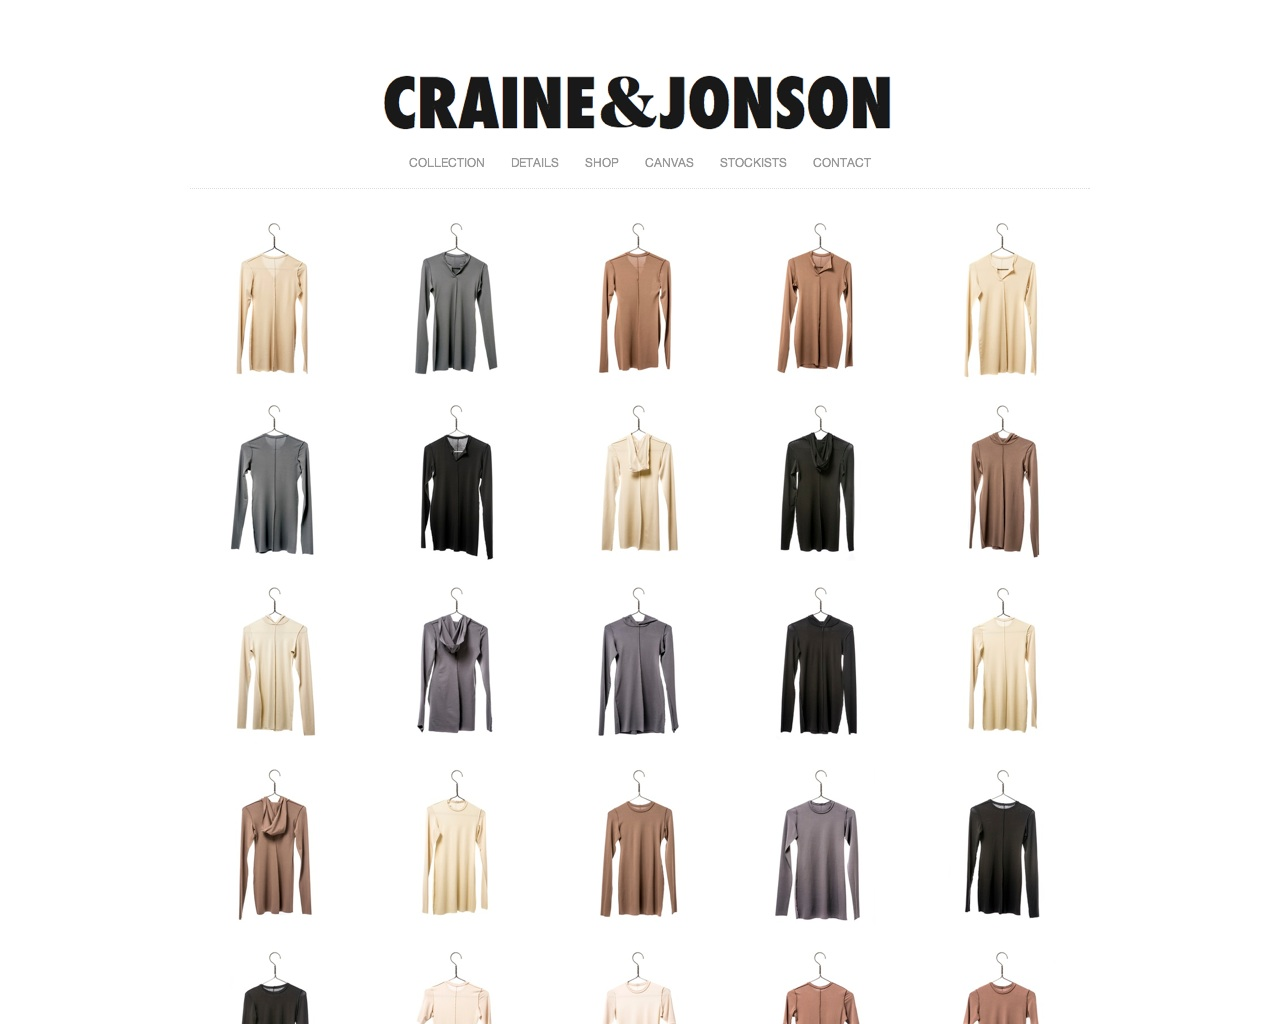 CRAINE&JONSON (20130821).jpg